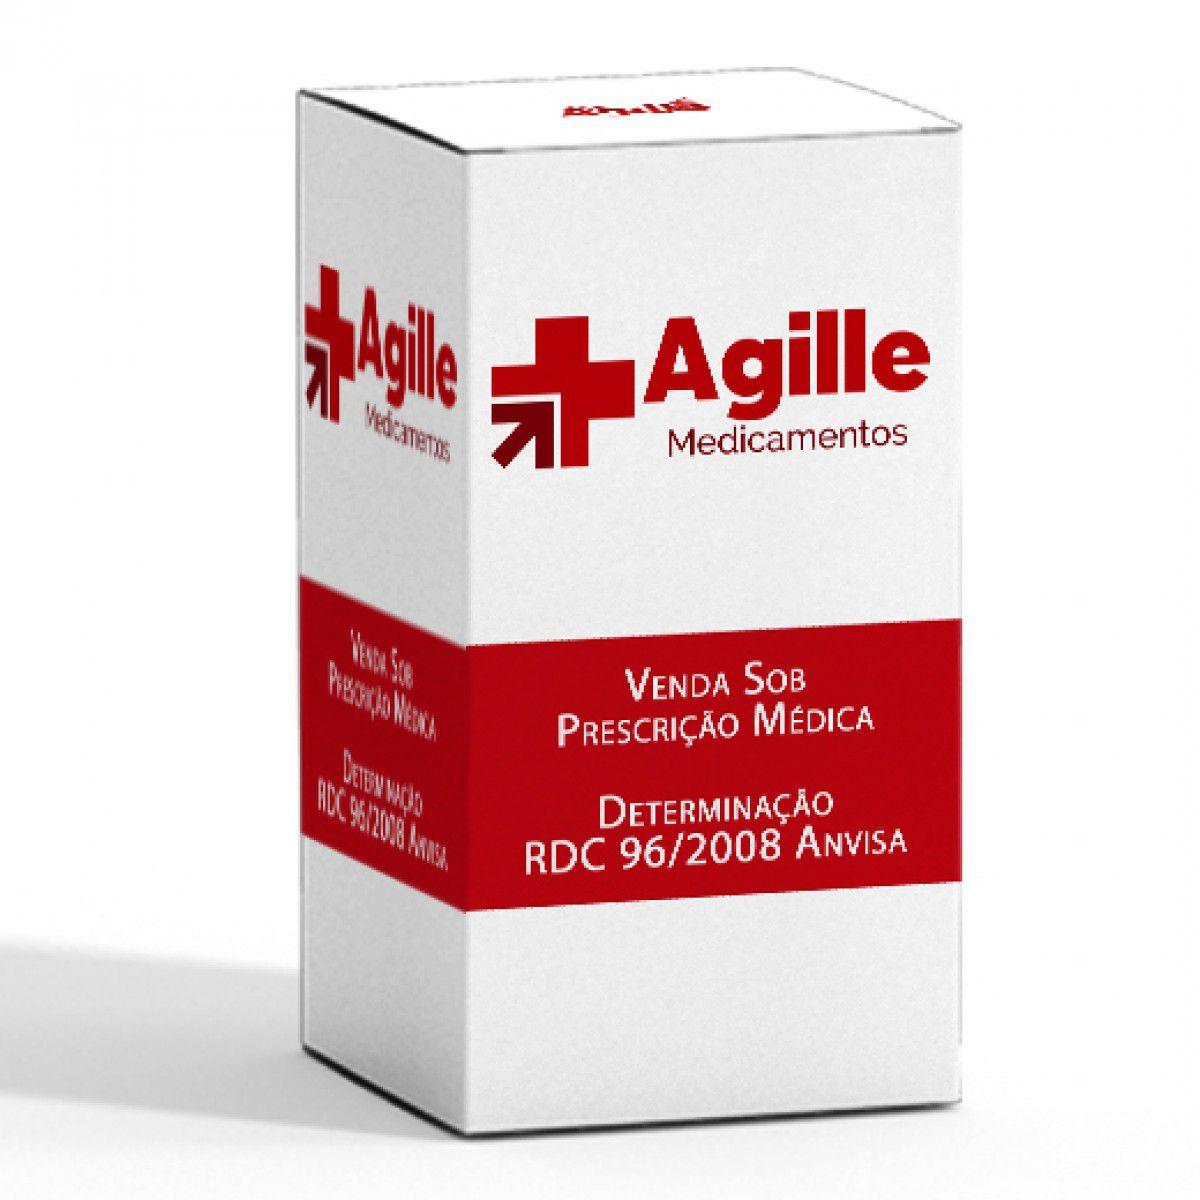 SANDIMMUN NEORAL 50MG (C/50 CPS GELATINA MOLE)  - Agille Speciality